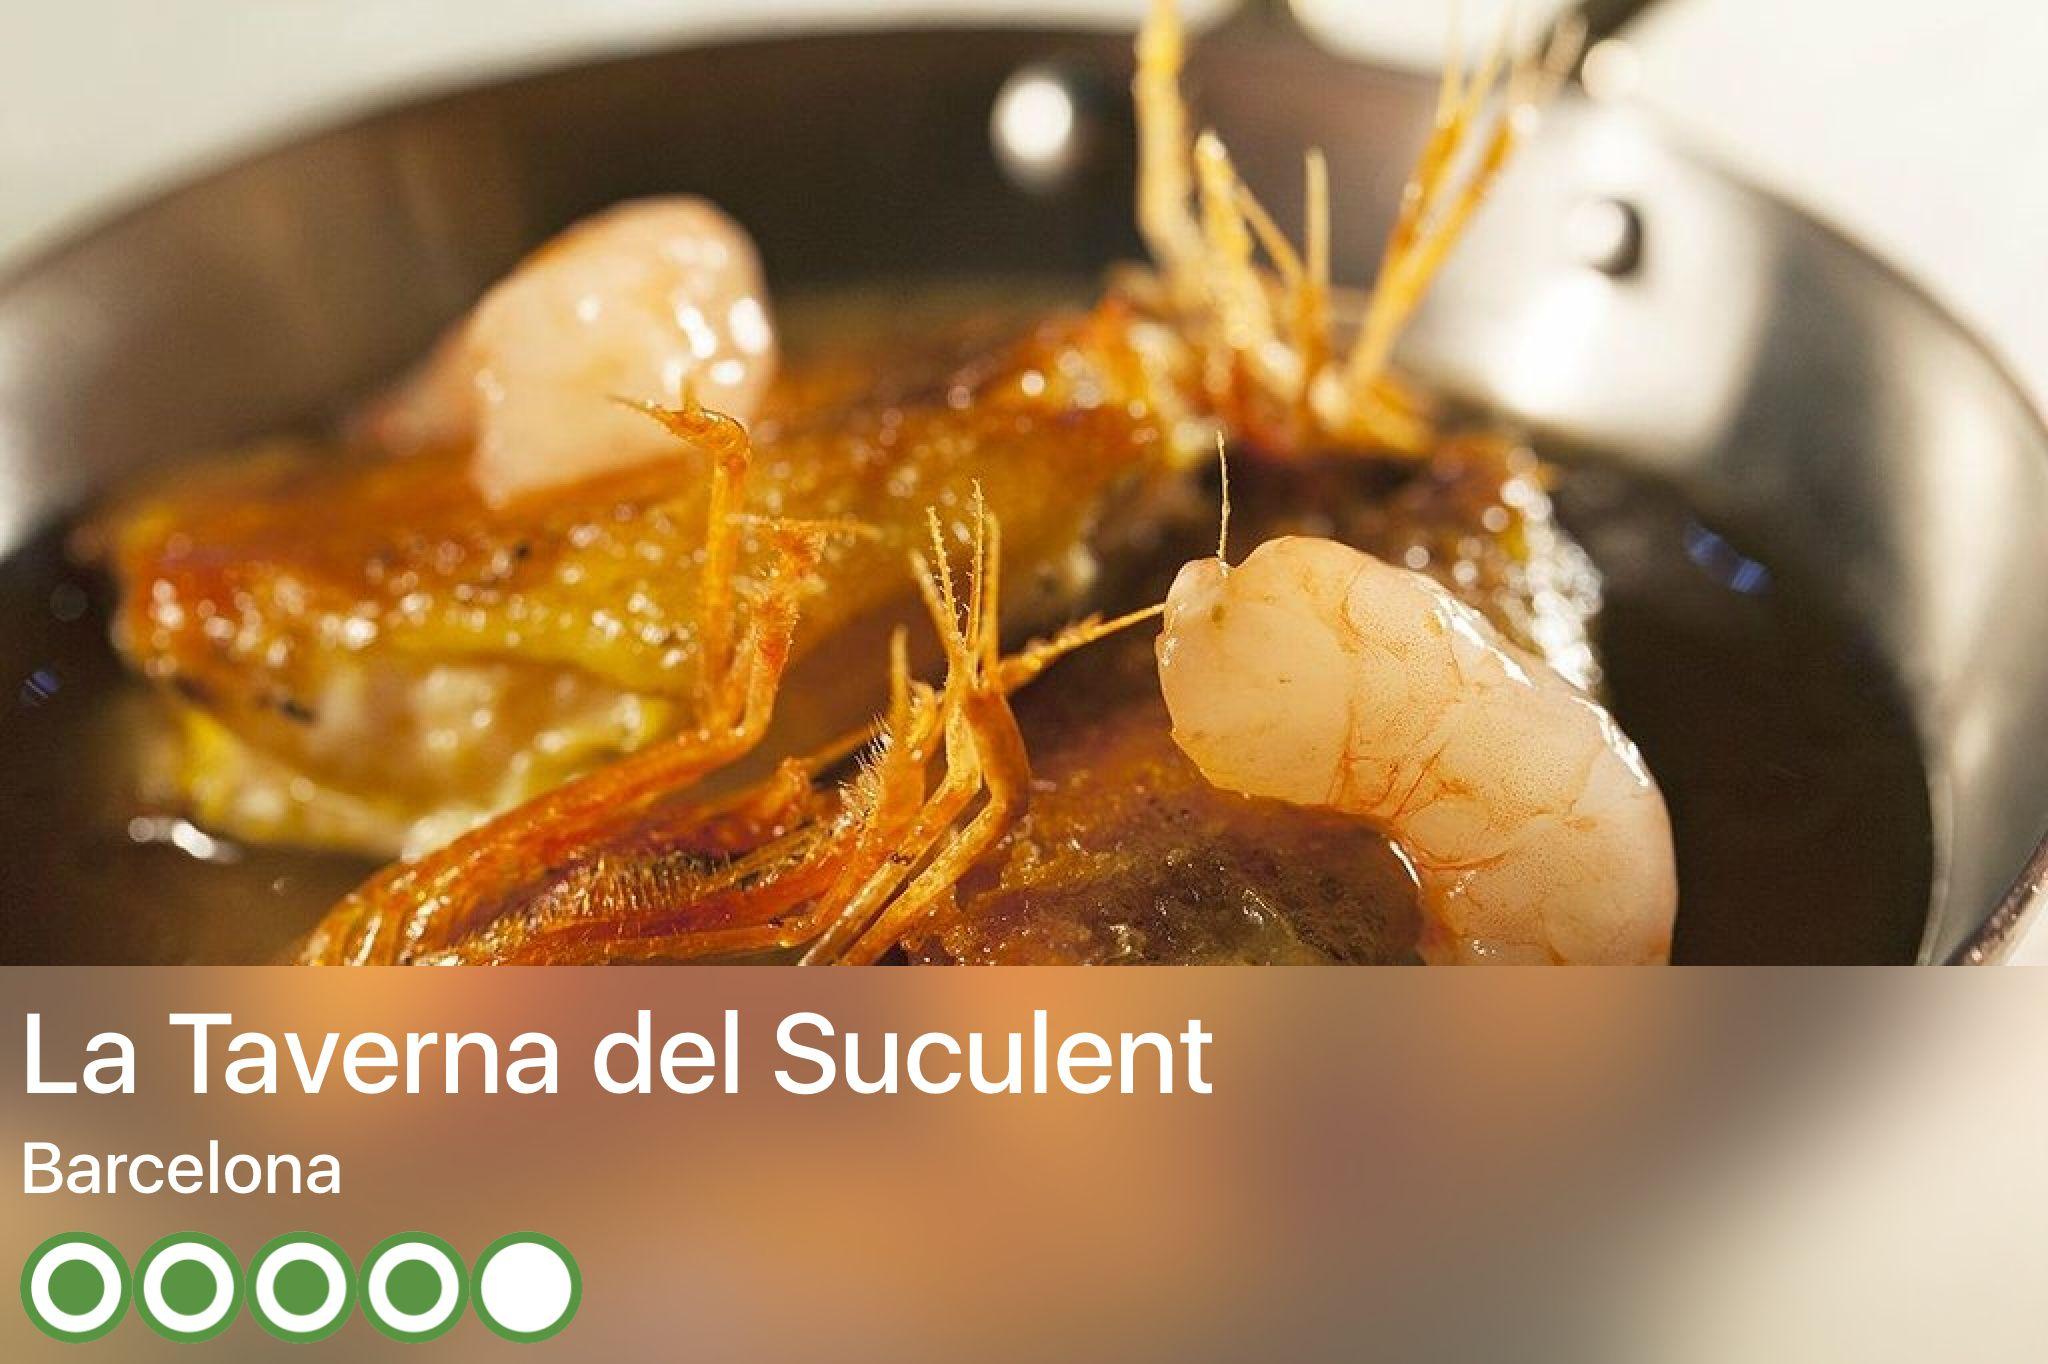 https://www.tripadvisor.co.uk/Restaurant_Review-g187497-d6840662-Reviews-La_Taverna_del_Suculent-Barcelona_Catalonia.html?m=19904